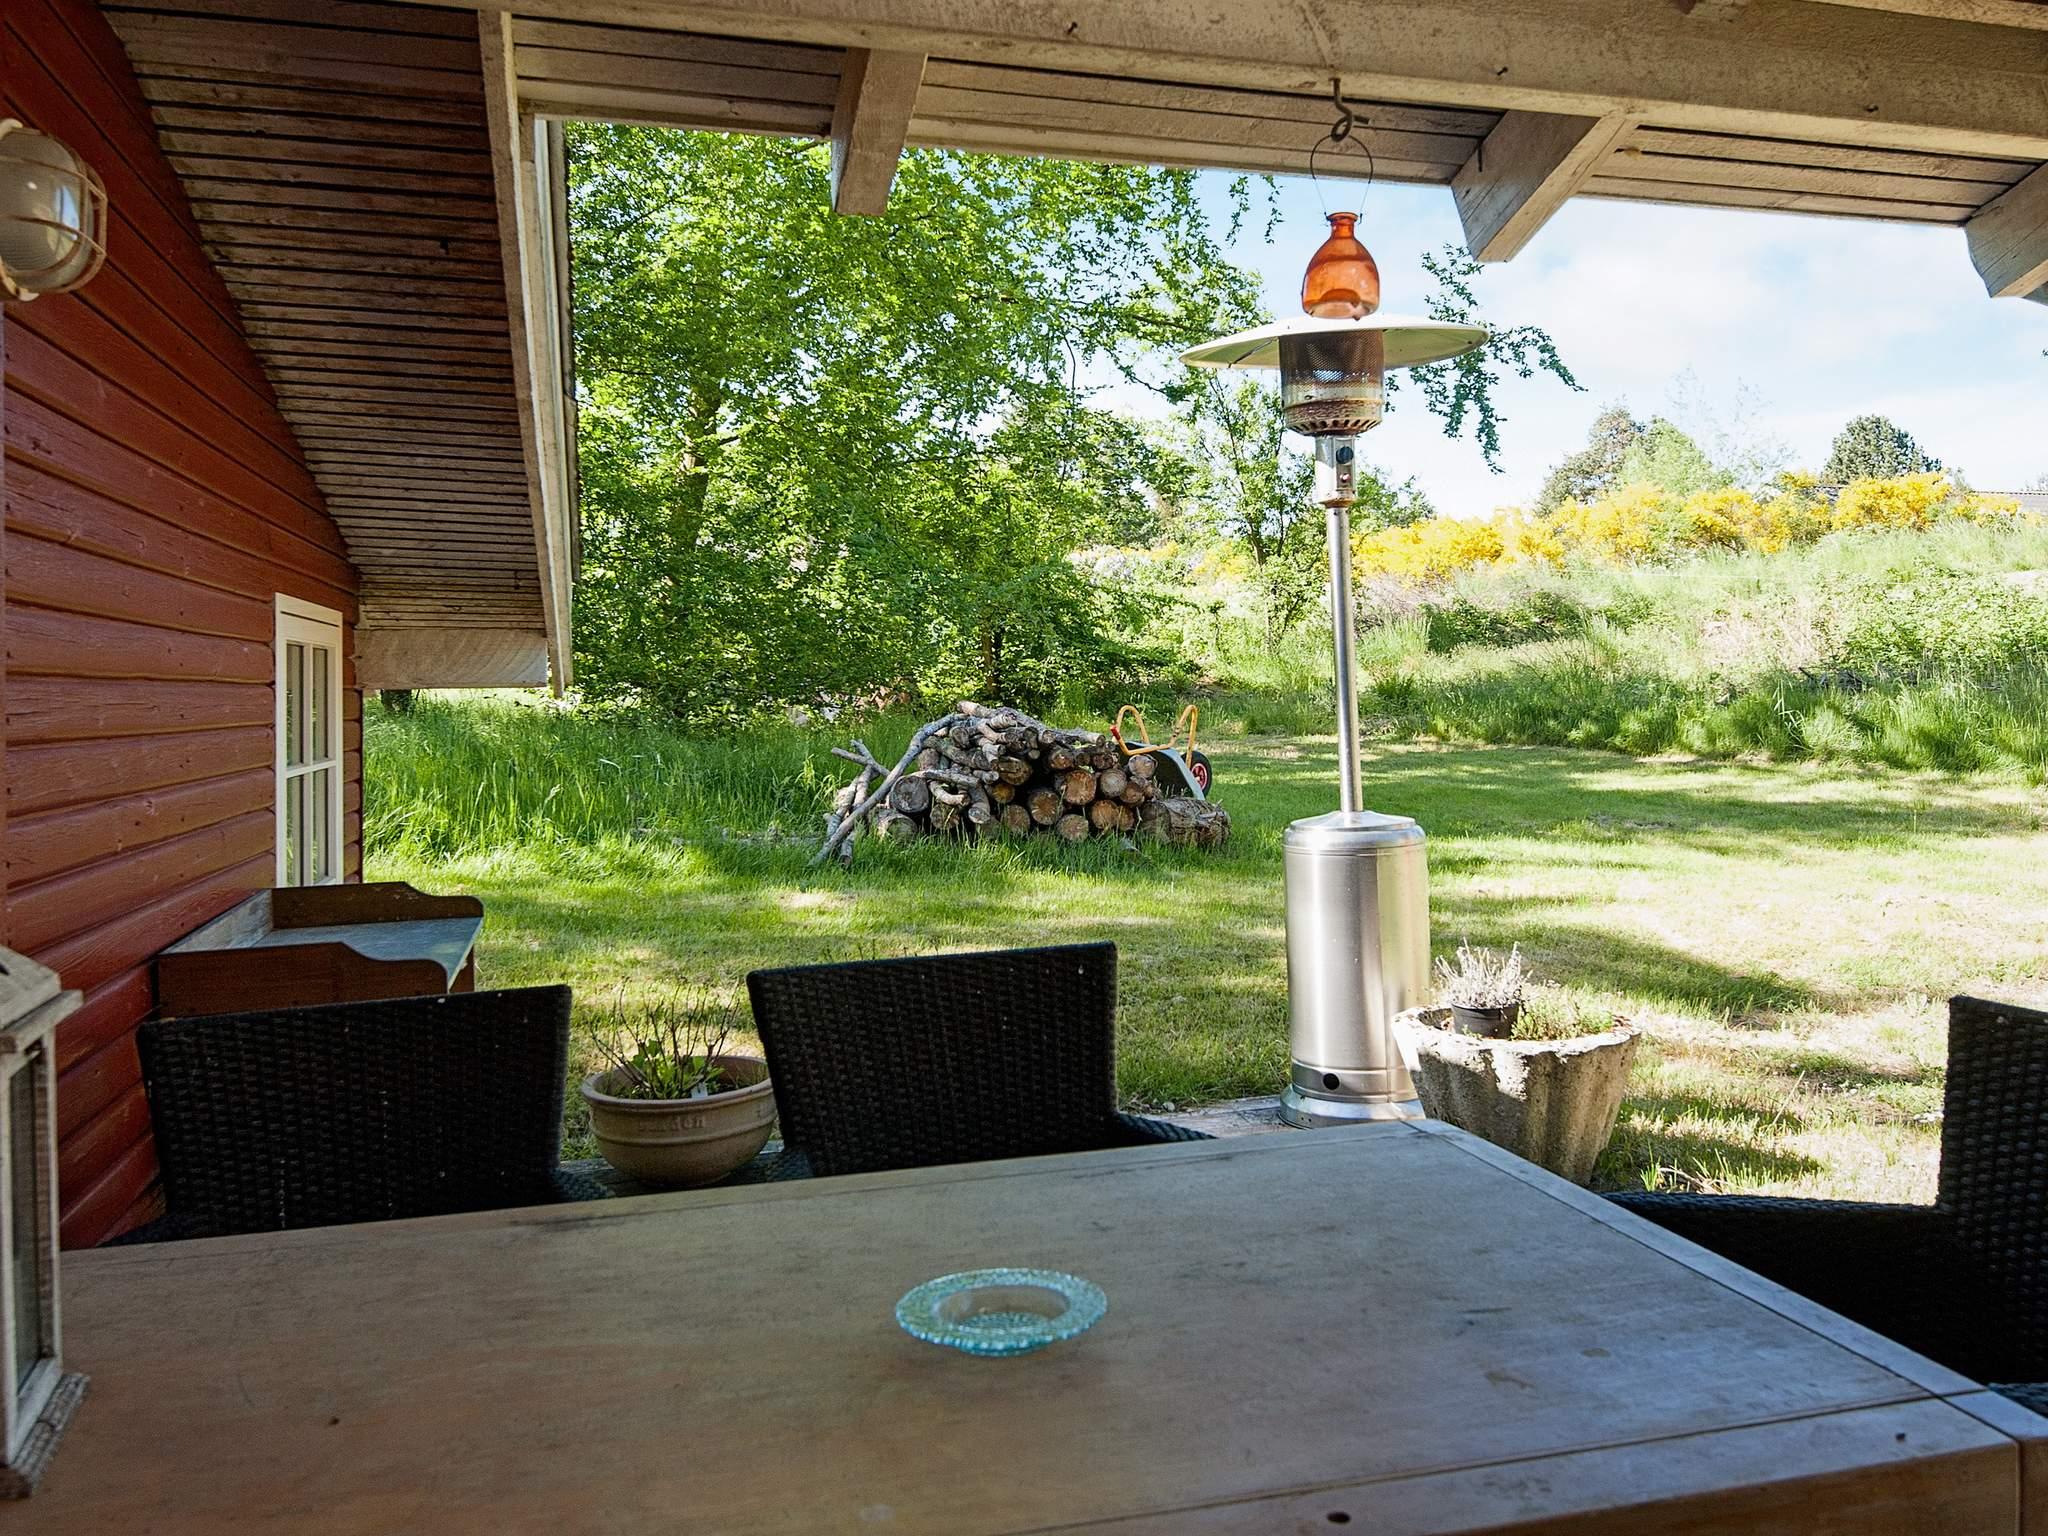 Maison de vacances Helgenæs (2354348), Knebel, , Mer Baltique danoise, Danemark, image 15